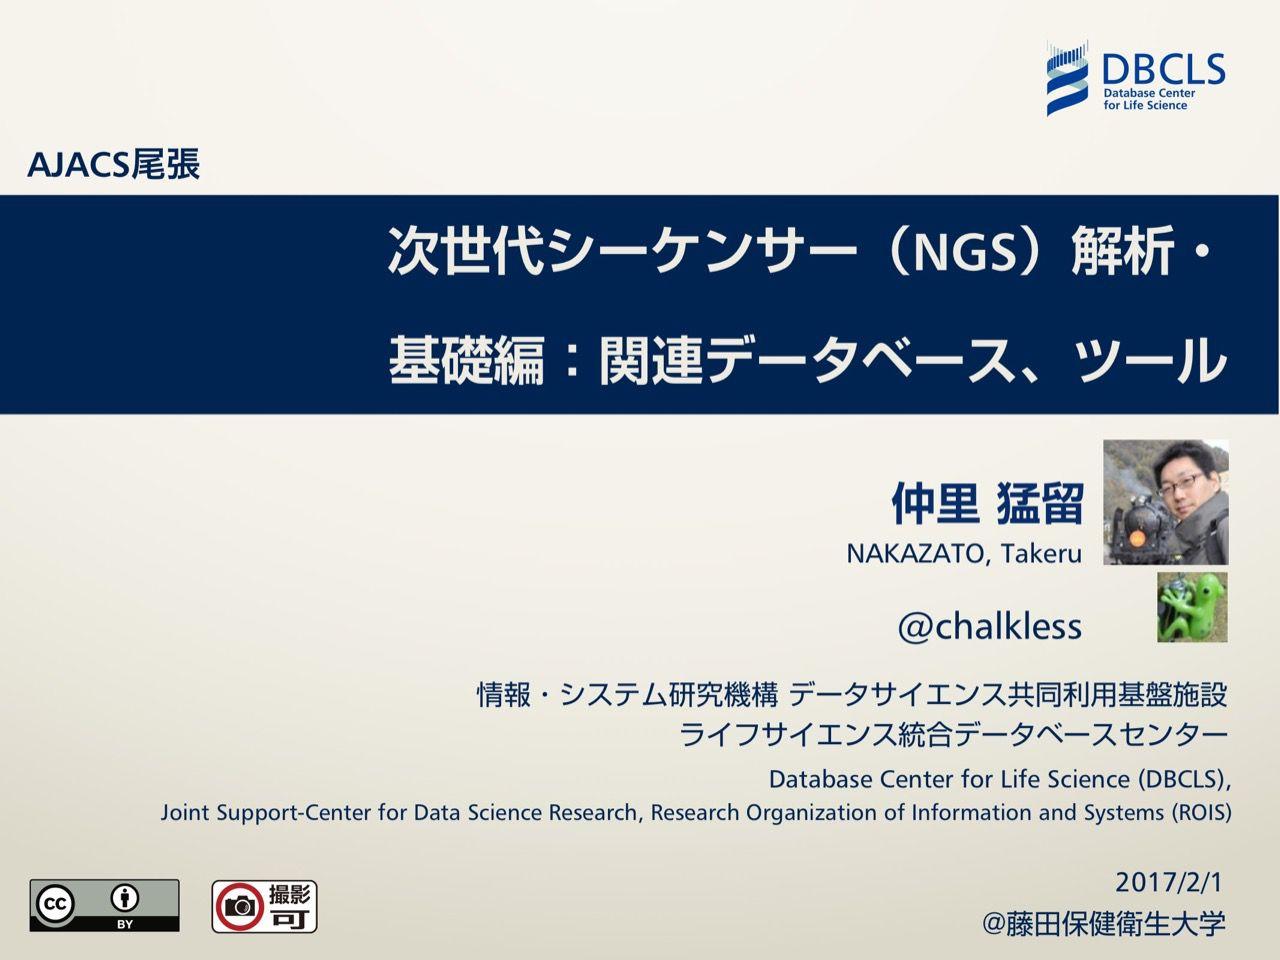 images/AJACS64_03_nakazato_001.jpg